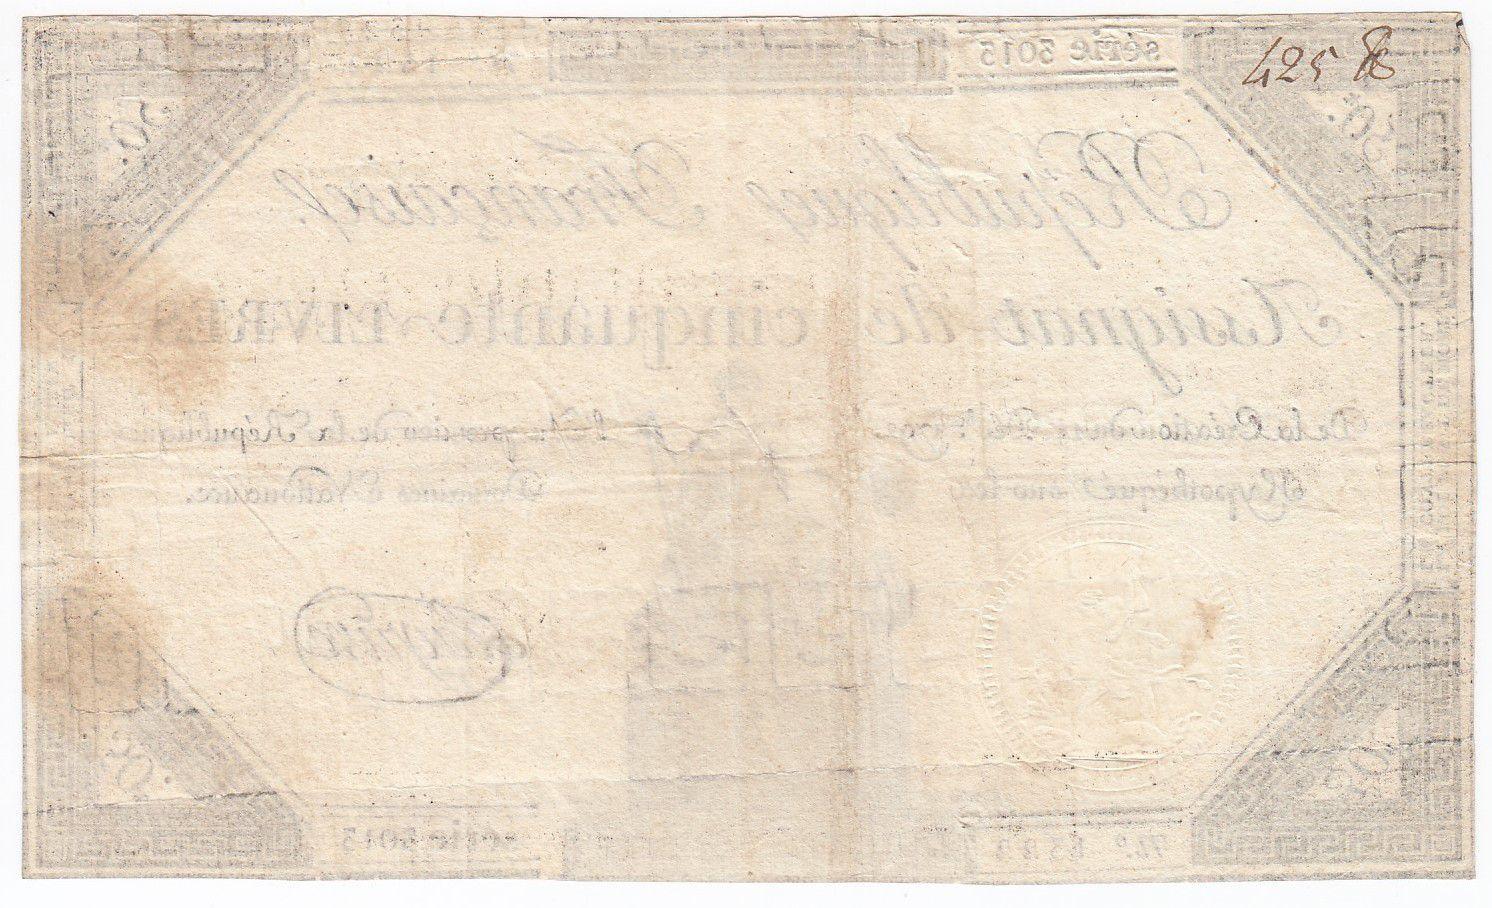 France 50 Livres France assise - 14-12-1792 - Sign. Lagrive - TTB